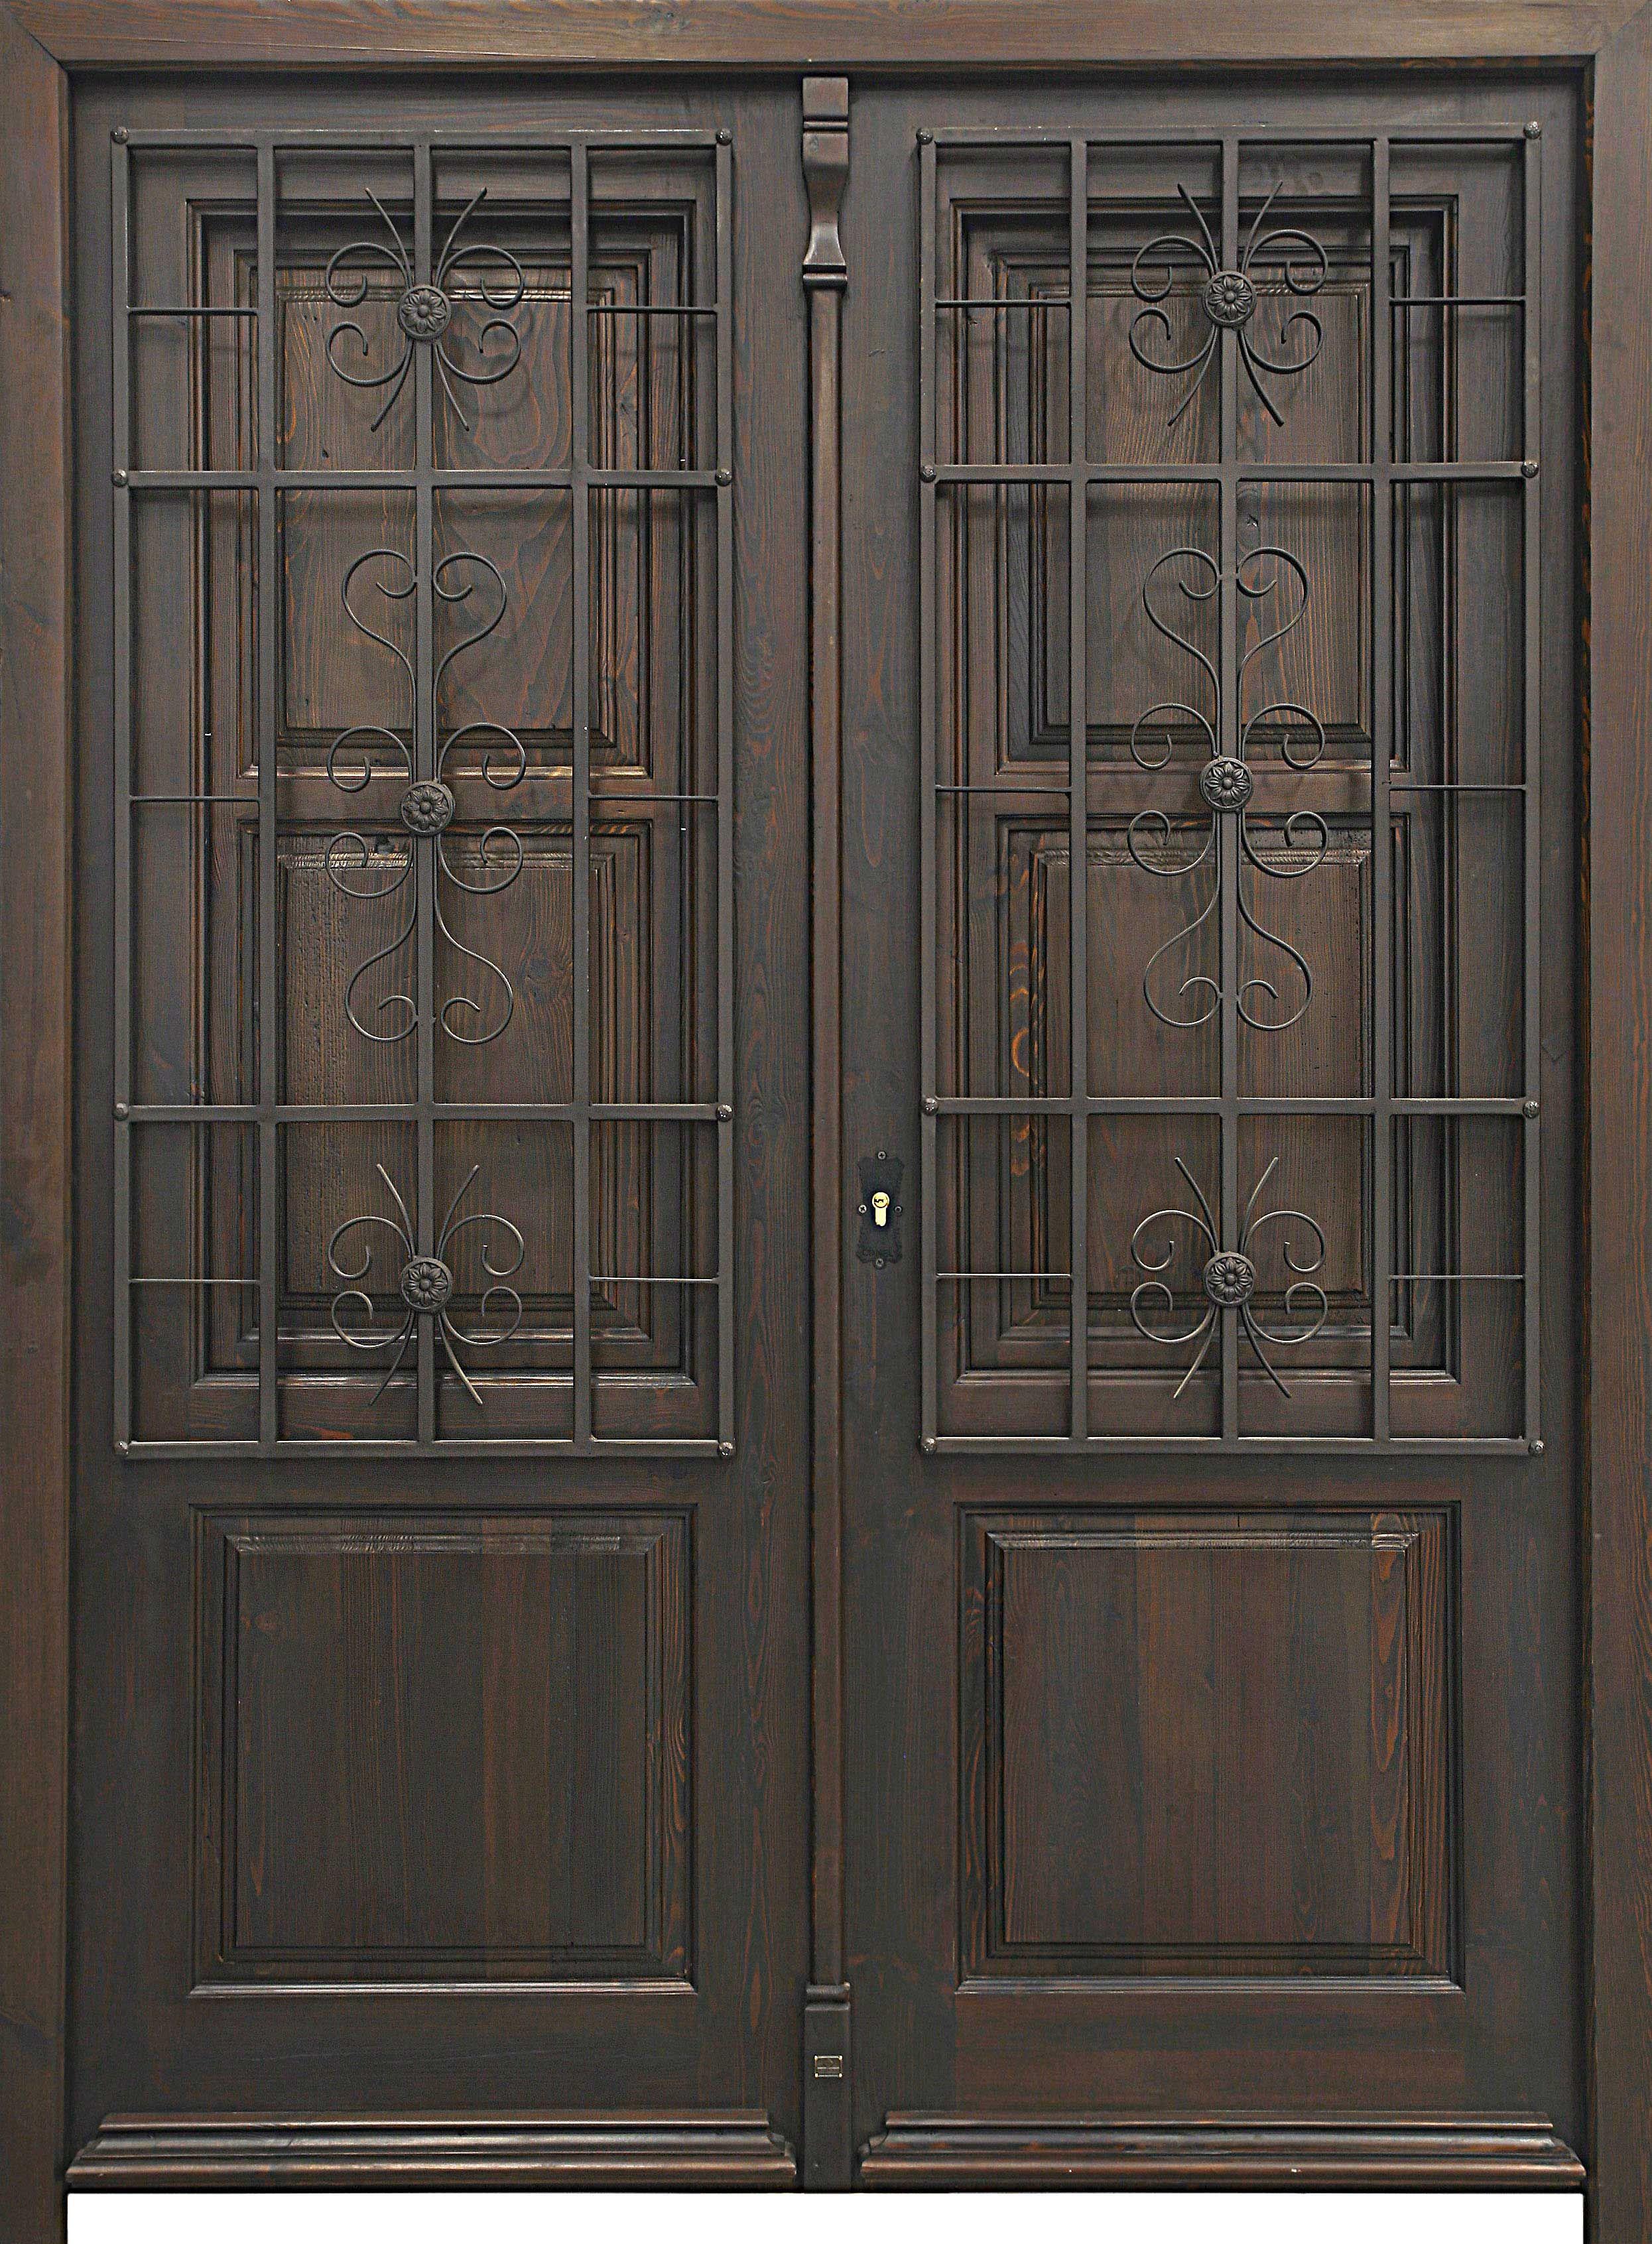 Araceli doble postigos de madera cerradura de seguridad for Puertas dobles antiguas